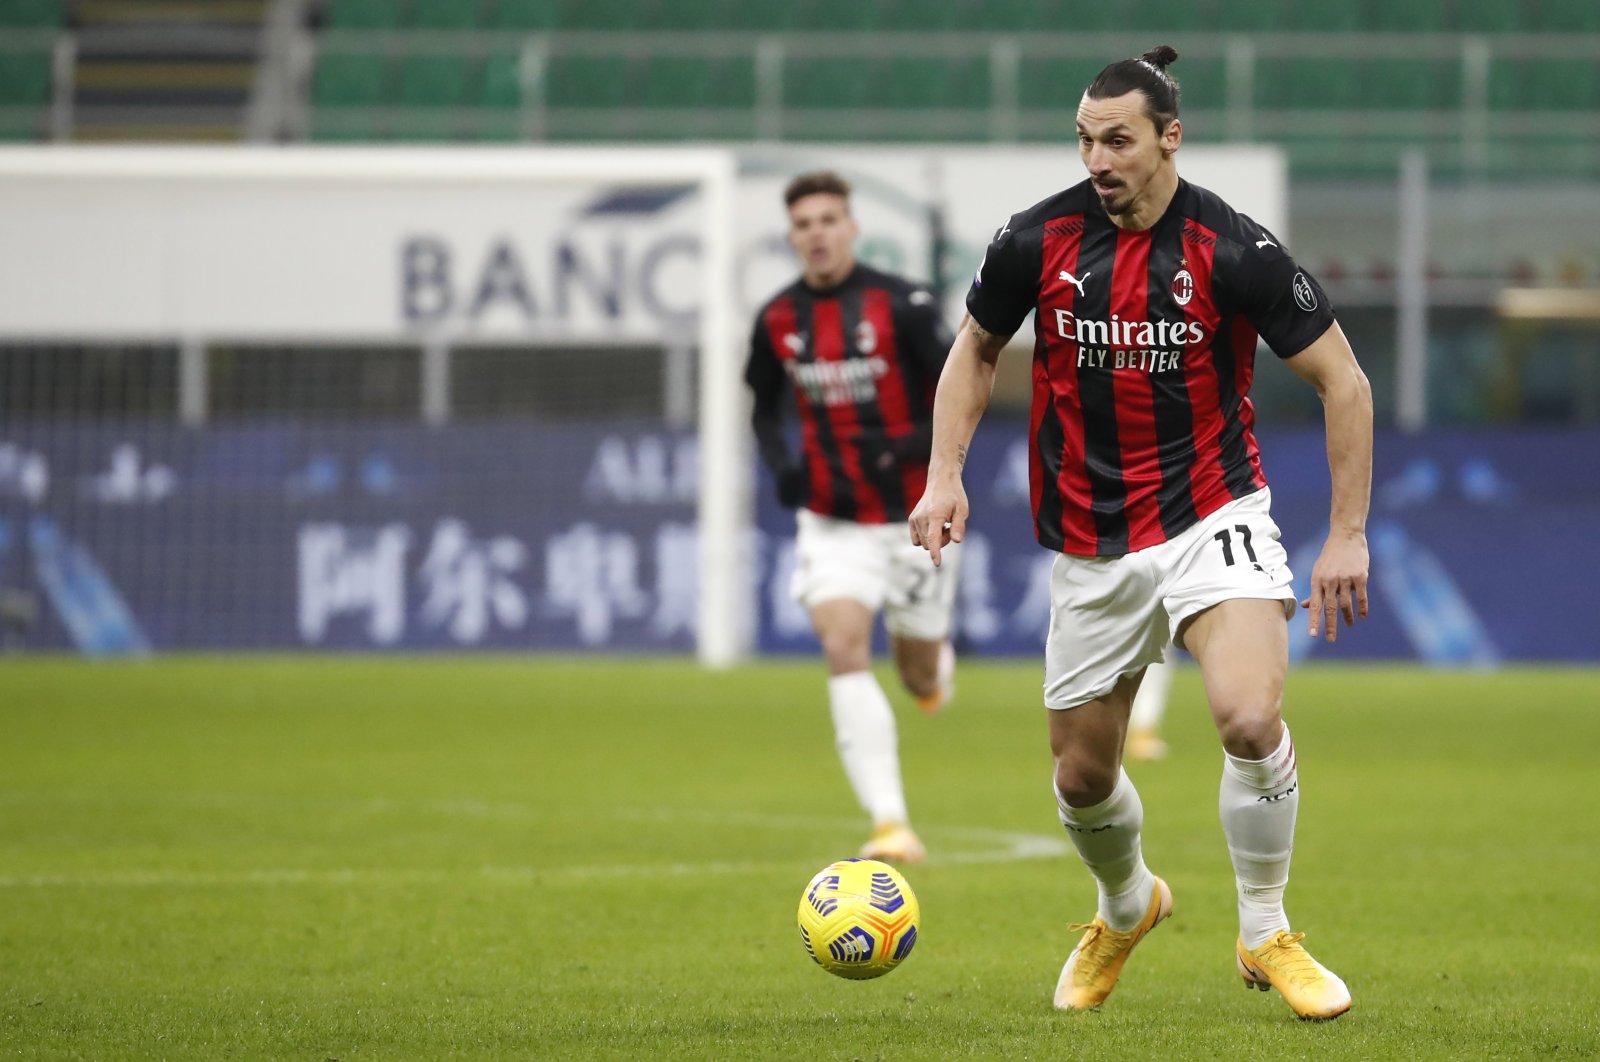 AC Milan's Zlatan Ibrahimovic in action during a Serie A match against Torino at the San Siro stadium, in Milan, Italy, Jan. 9, 2021. (AP Photo)